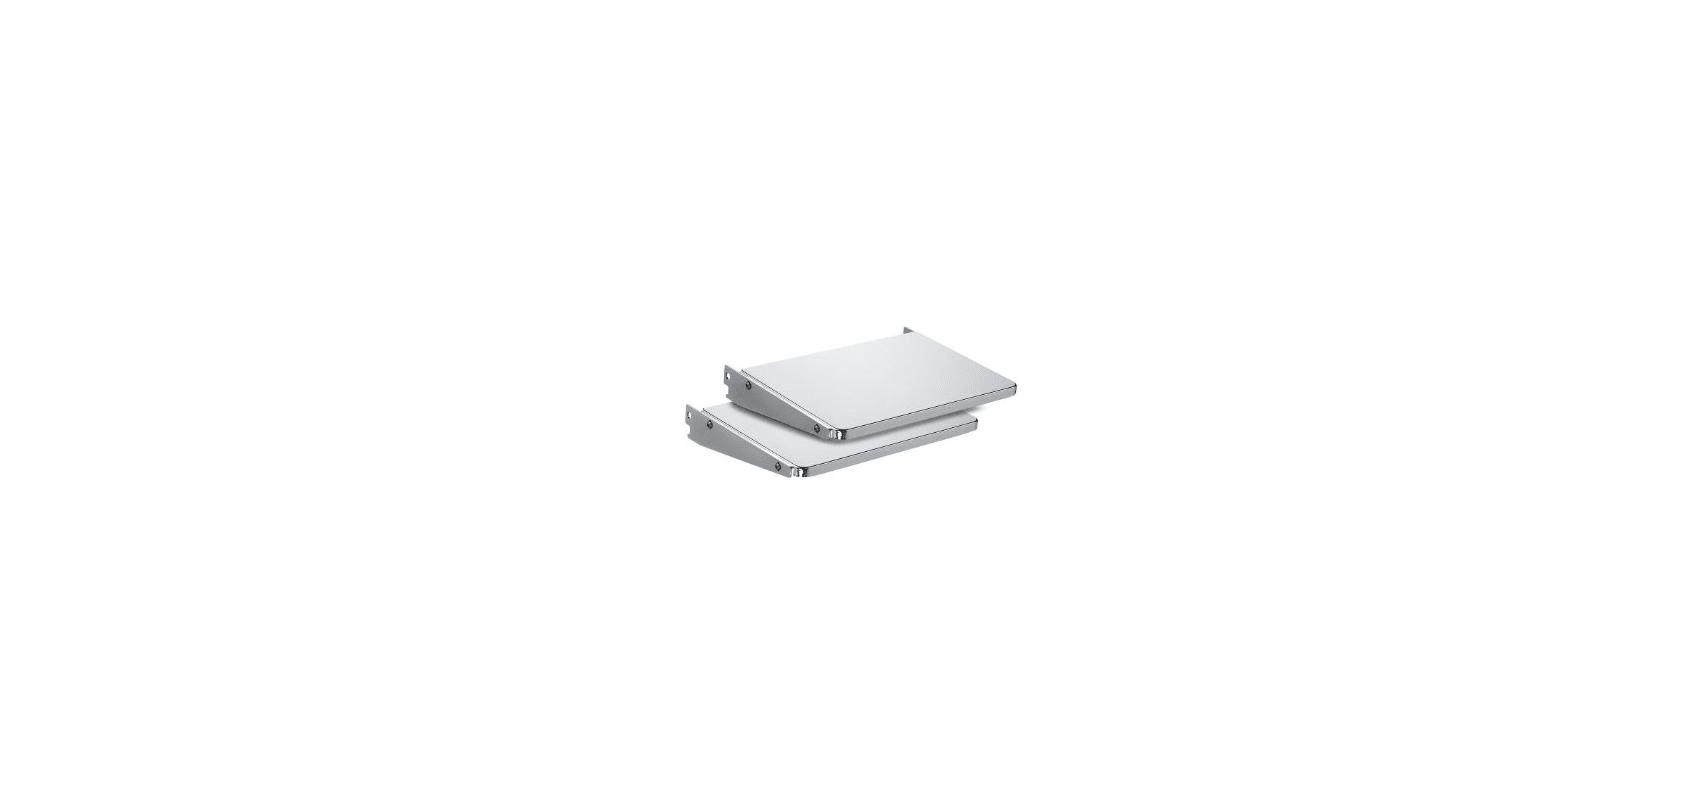 Dewalt DW7351 13 Folding Tables for DW735 Planer